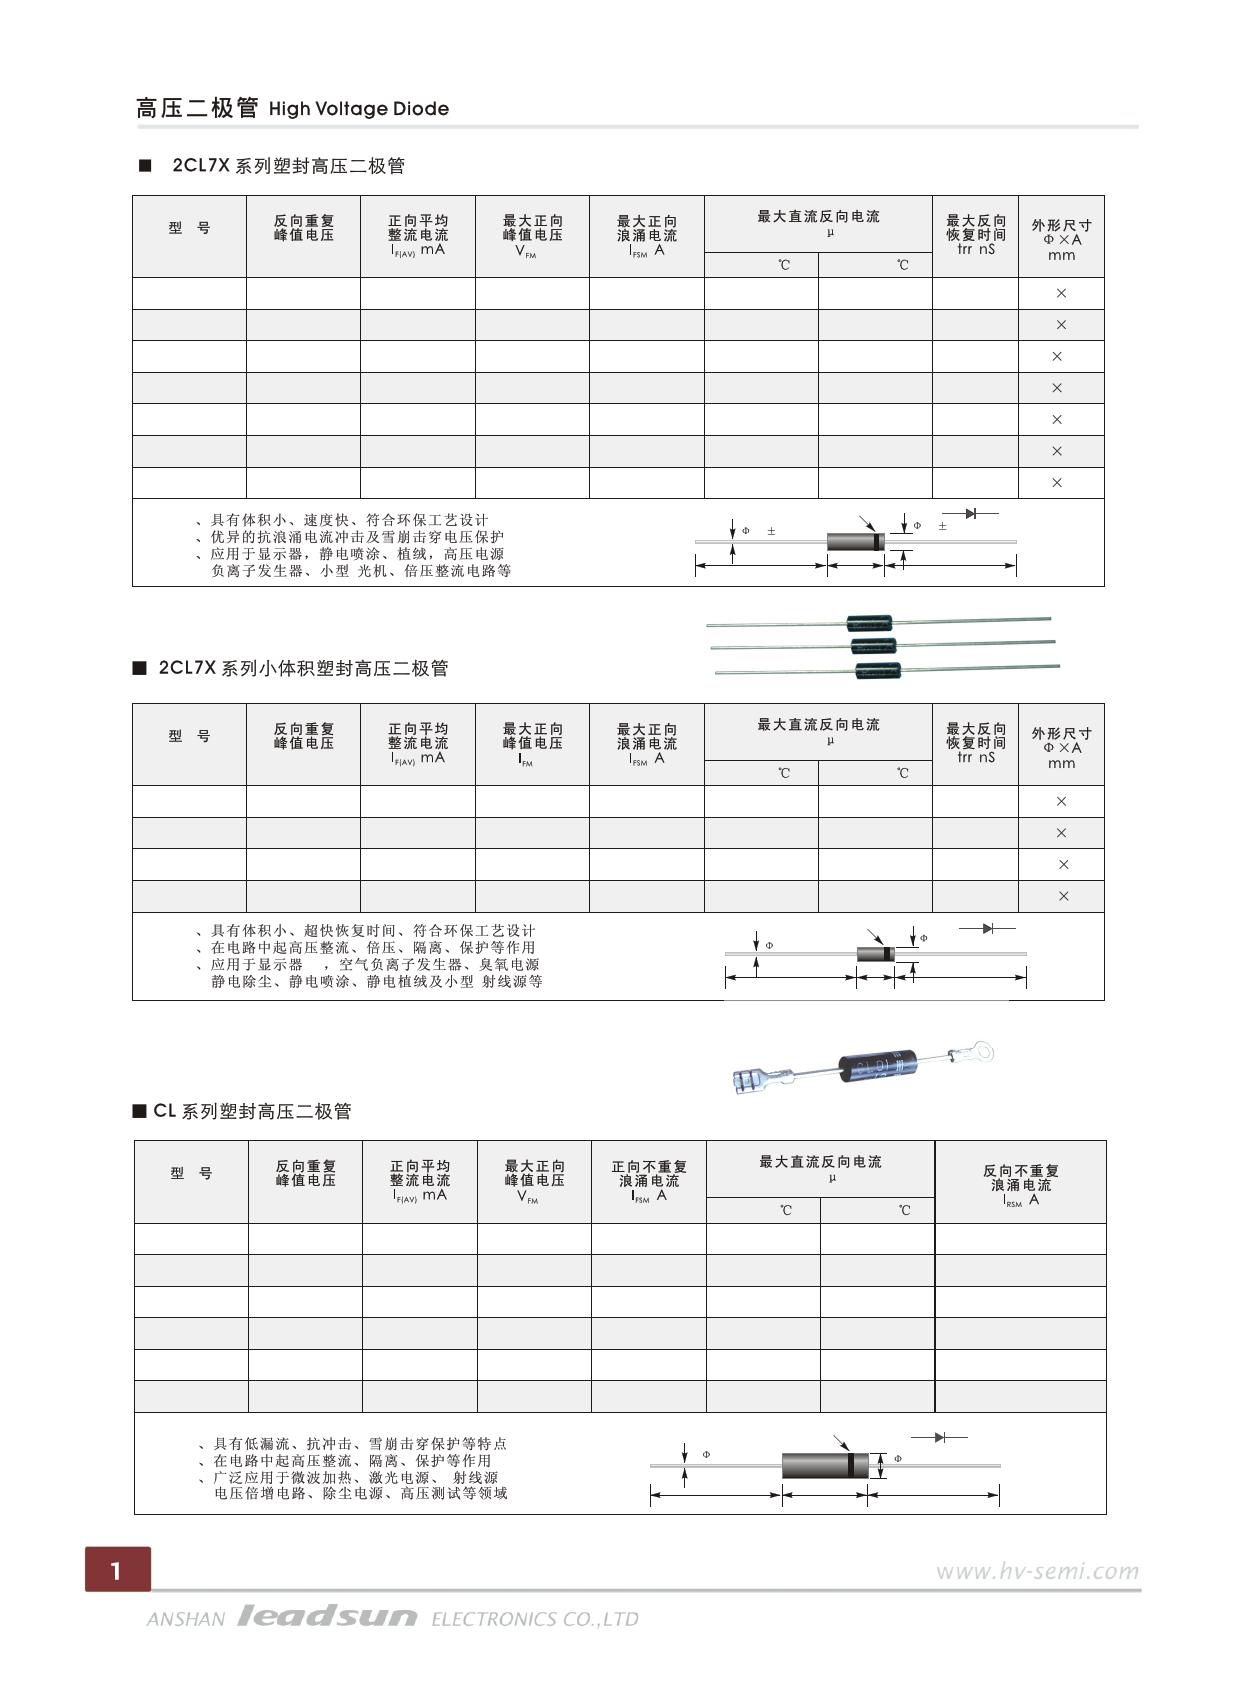 2CL75 datasheet